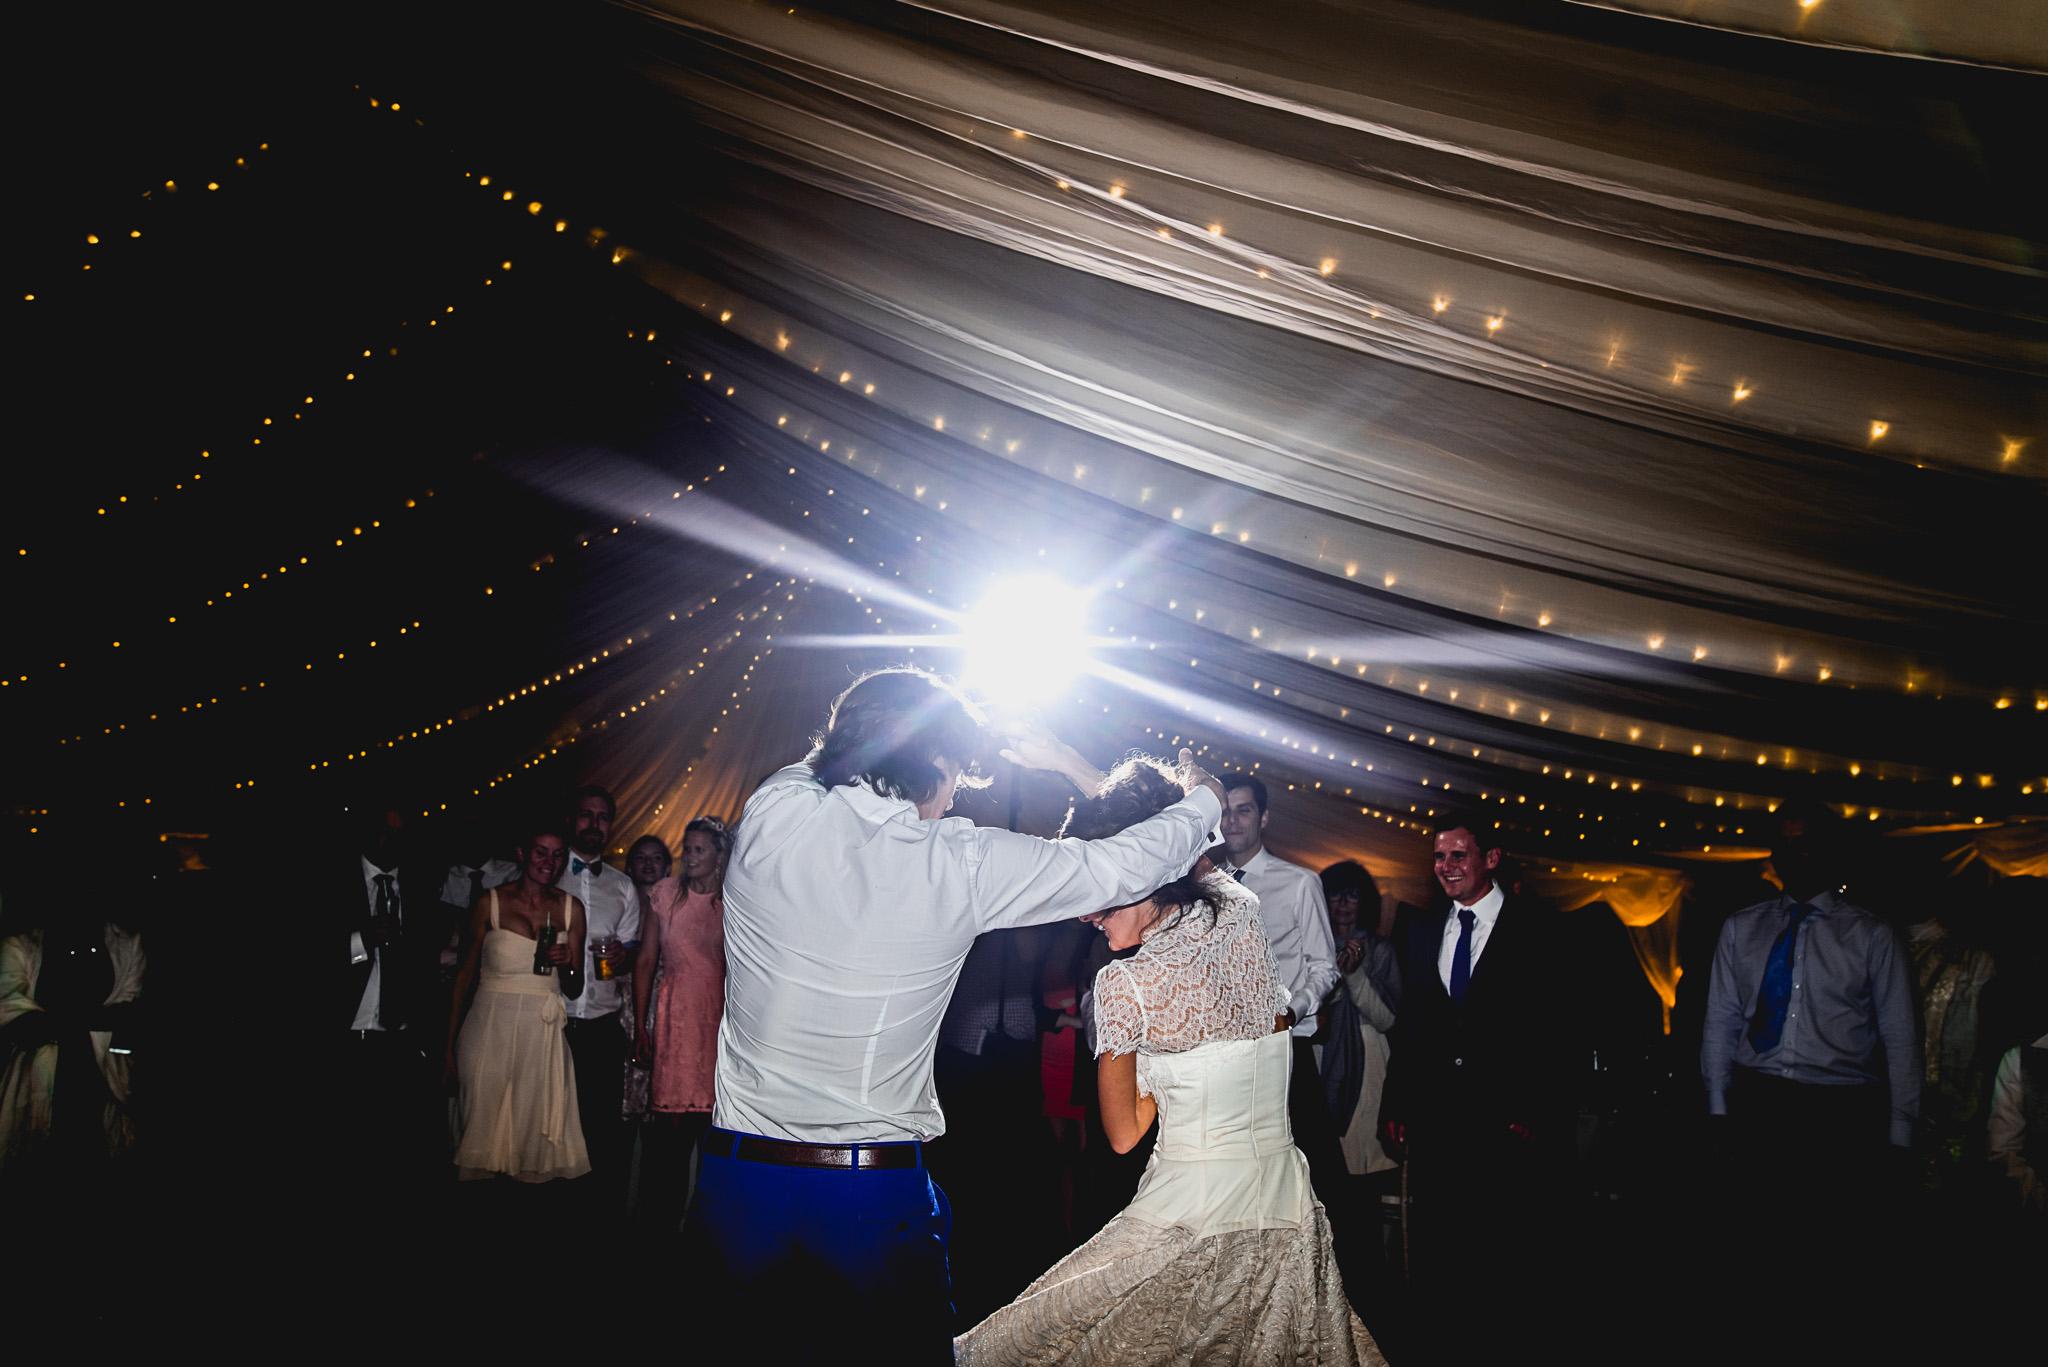 Lara & Jack Wedding 220815 by Barney Walters_1061_BW2_1088